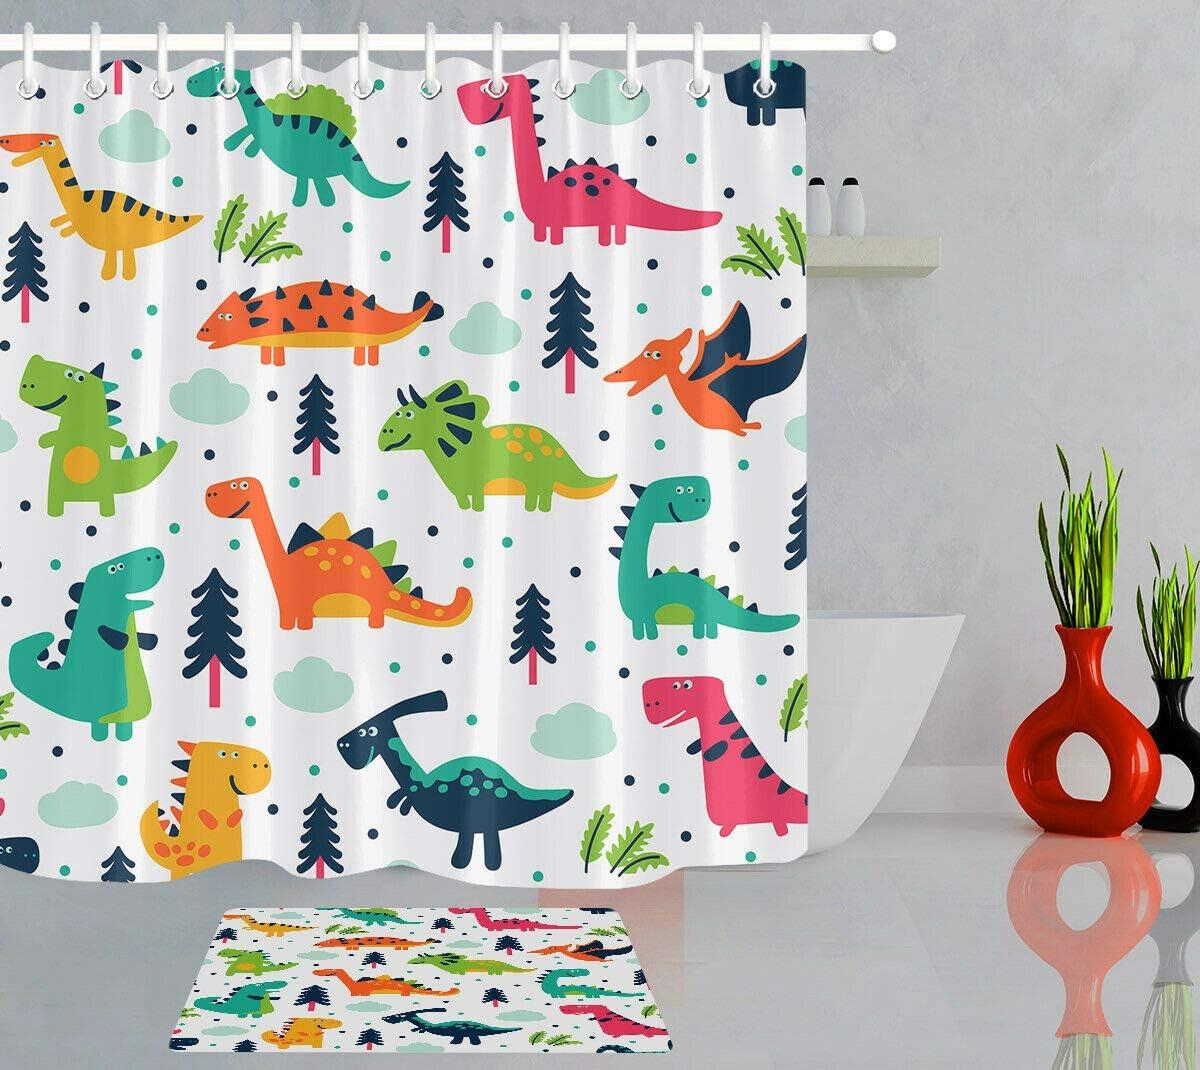 vrupi Cute Dibujos Animados Dinosaurios Moda Infantil Cortina ba/ño Conjunto impresi/ón 3D 12 Ganchos Revestimiento Impermeable Tela poli/éster ba/ño Cortina ba/ño 71x71 Pulgadas Alfombra ba/ño 60x40cm